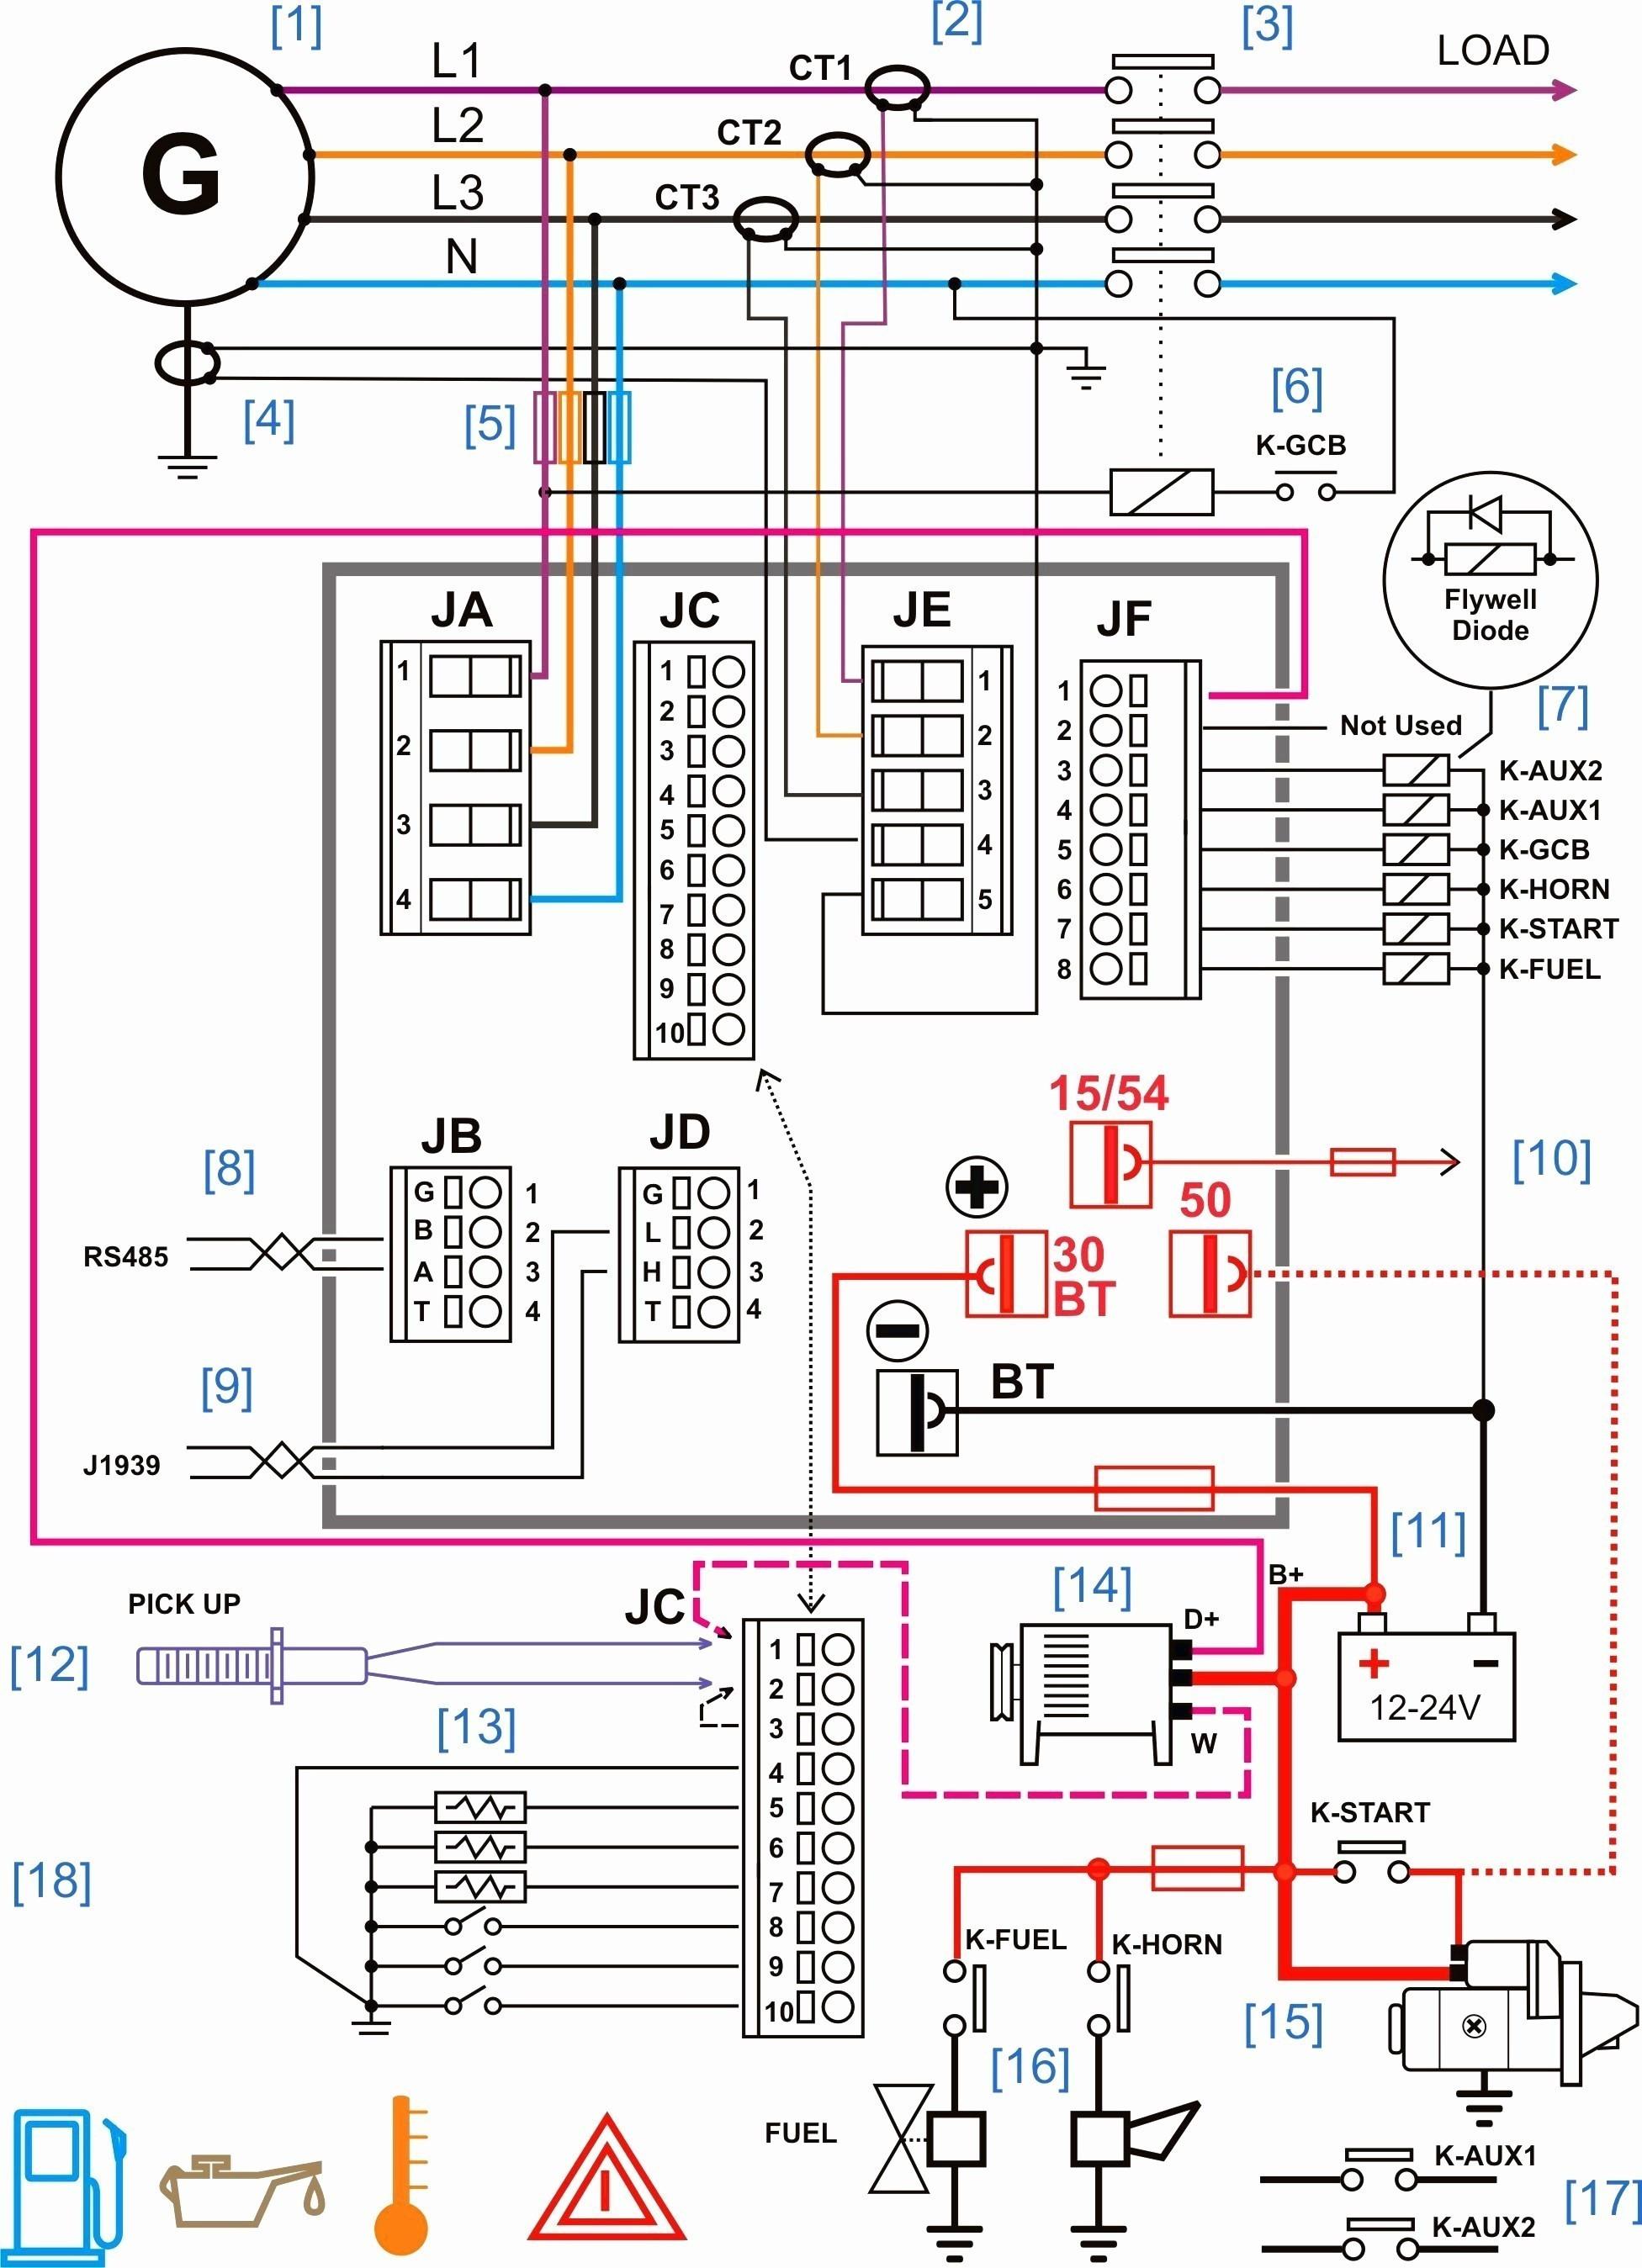 Car Radio Harness Diagram Wiring Diagram Book Best Wiring Harness Diagram Book Car Stereo Of Car Radio Harness Diagram